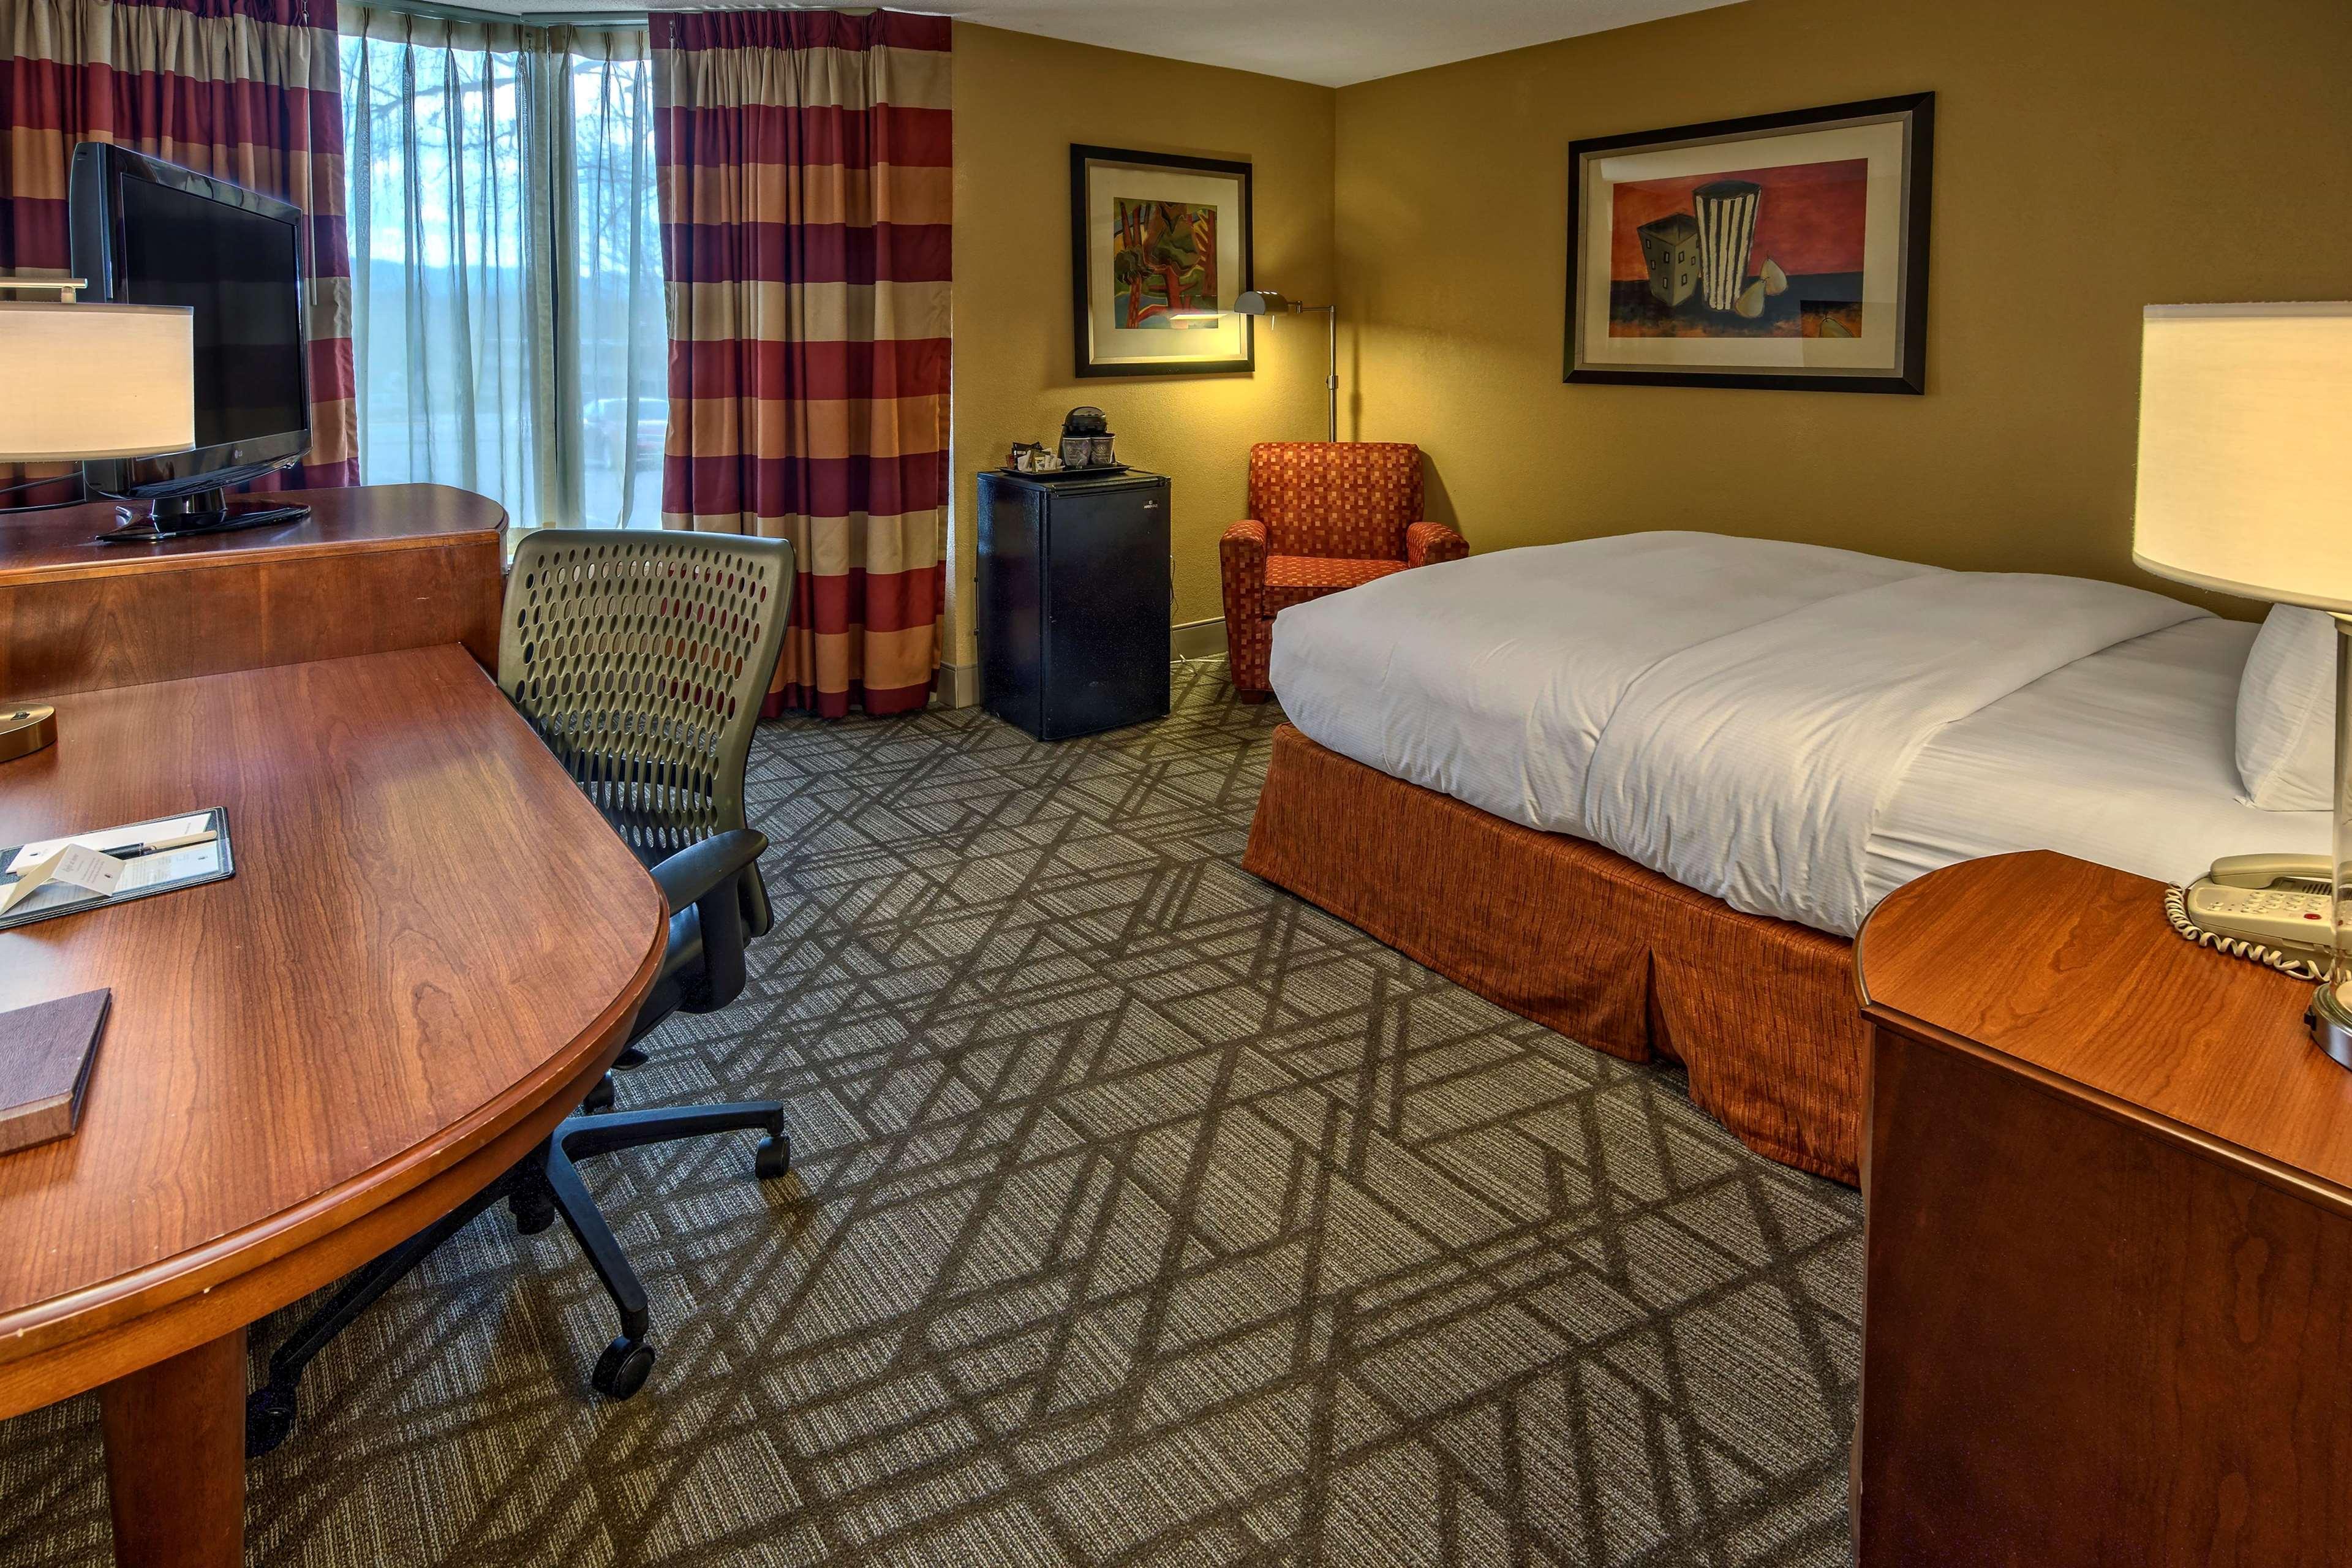 DoubleTree by Hilton Hotel Oak Ridge - Knoxville image 36